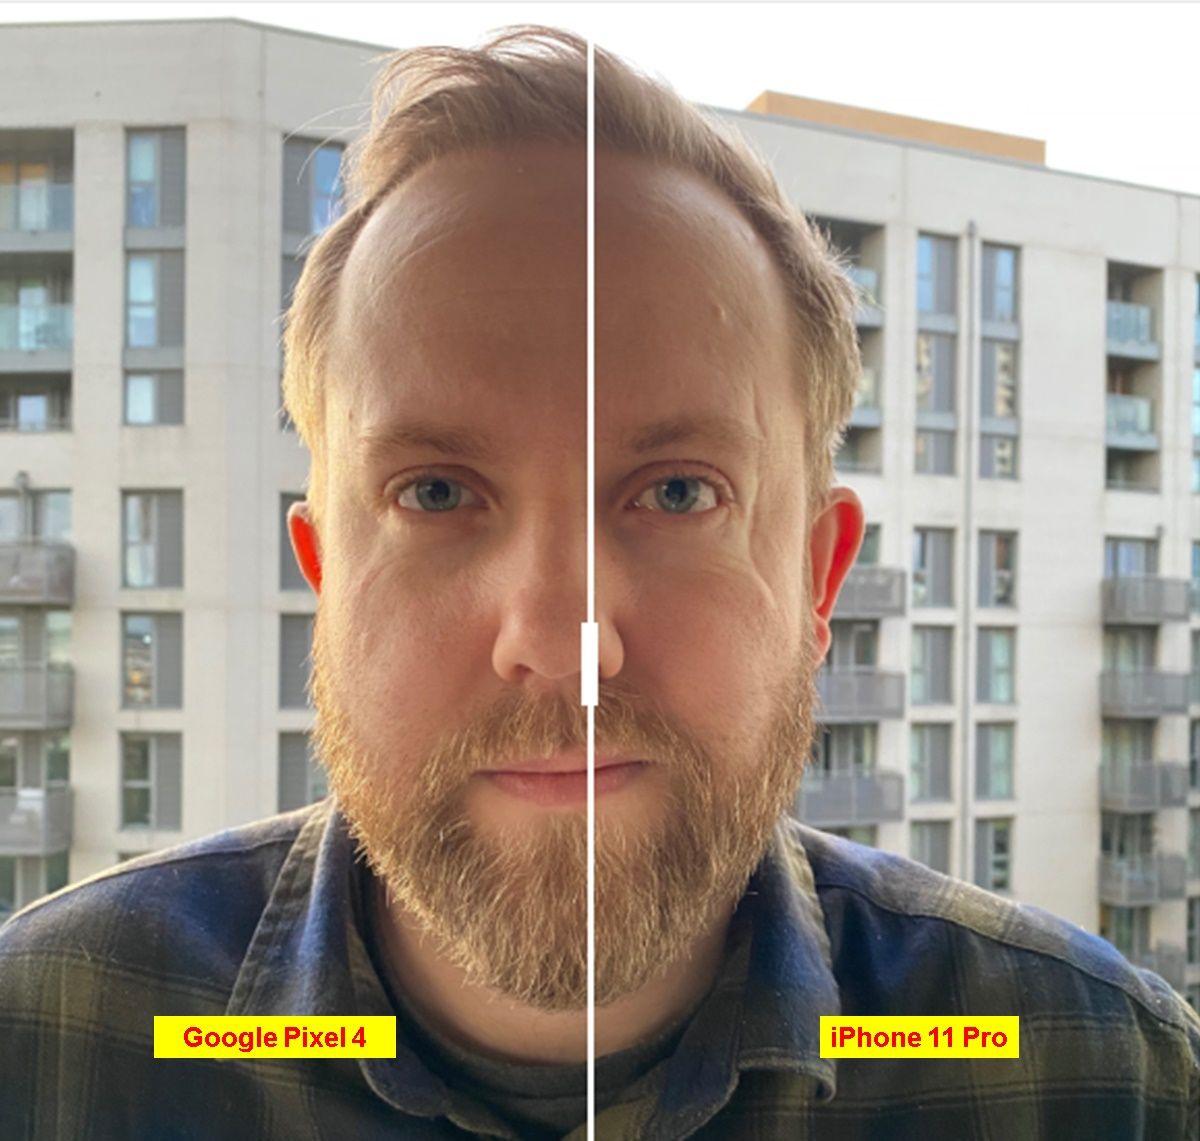 foto retrato humano iphone 11 pro vs google pixel 4